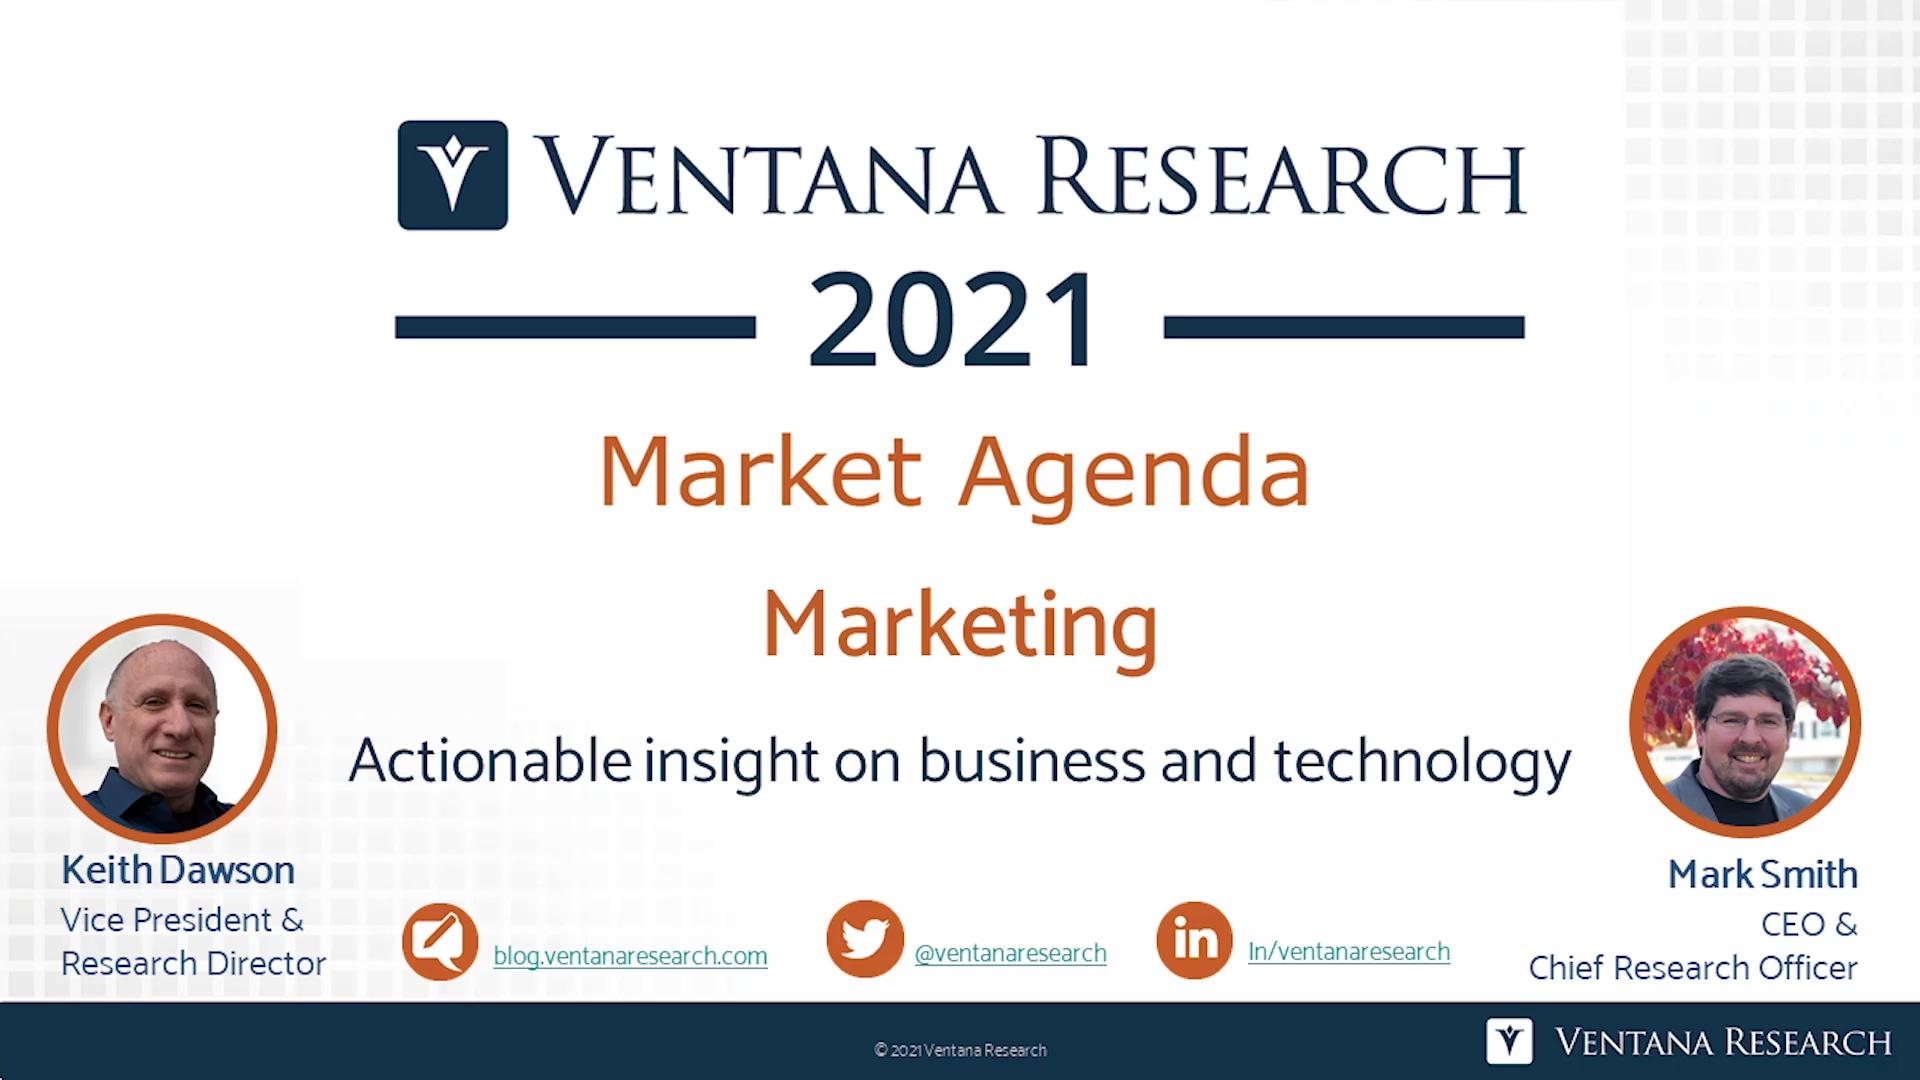 Ventana Research 2021 Market Agenda for Marketing